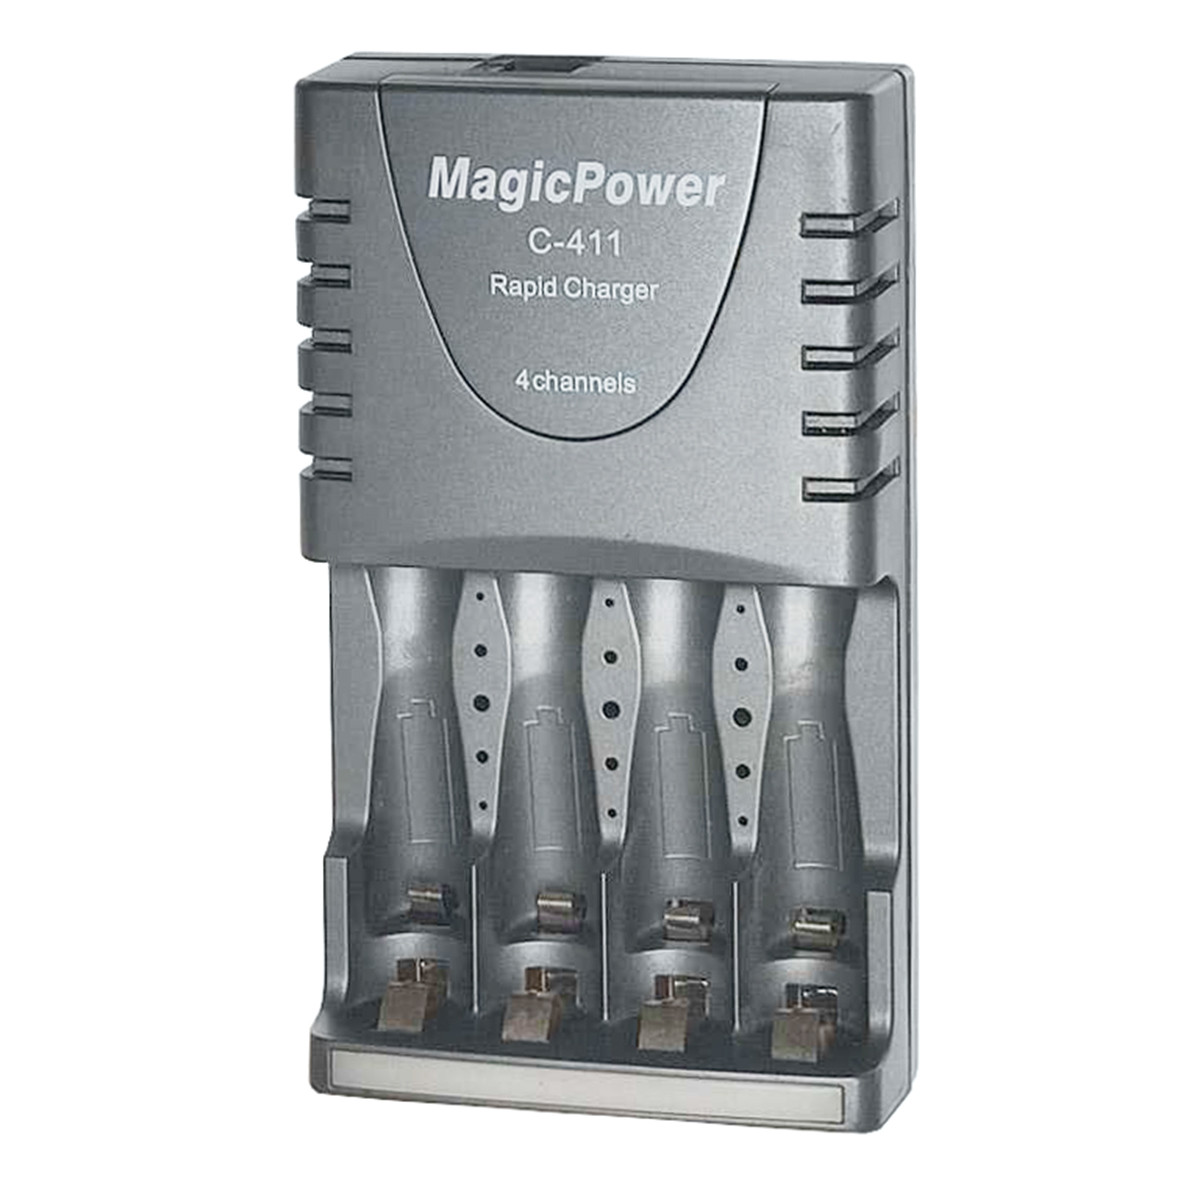 Зарядное устройство 3в1 Magic Power (C-411) 4xAA/AAA (сеть, авто)